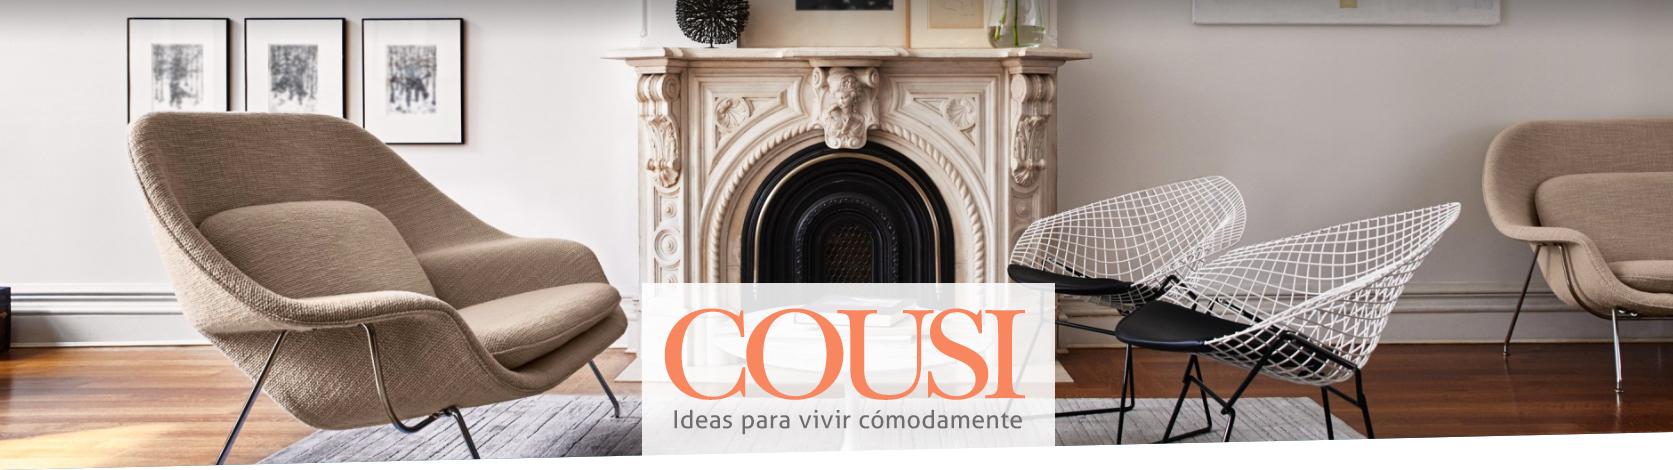 CousiV3-1